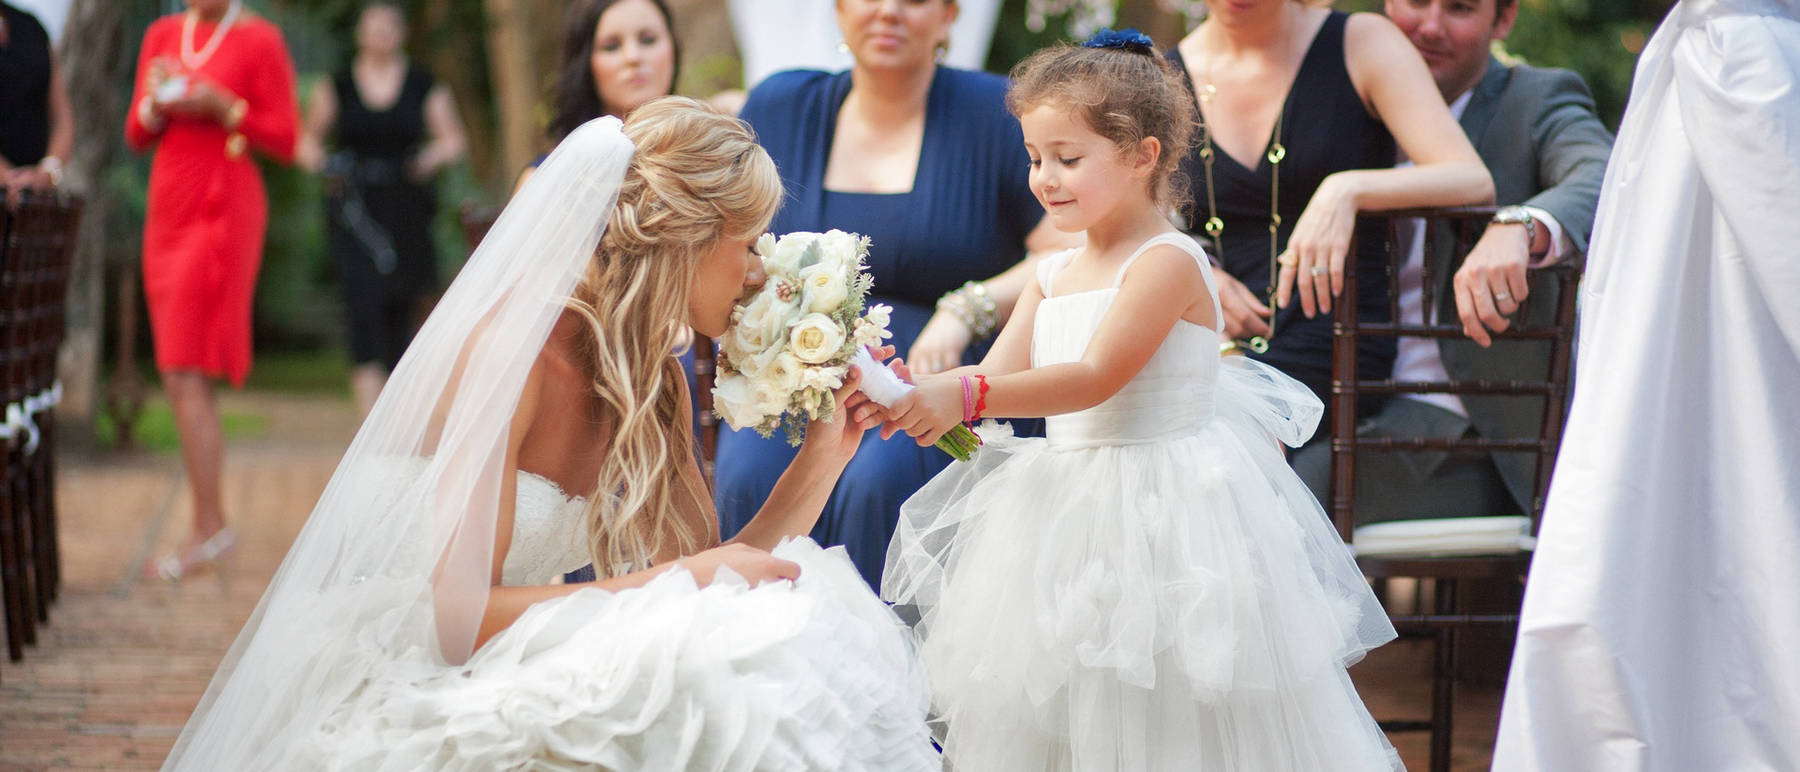 johnandjoseph-wedding-photographer-hz-slider-372